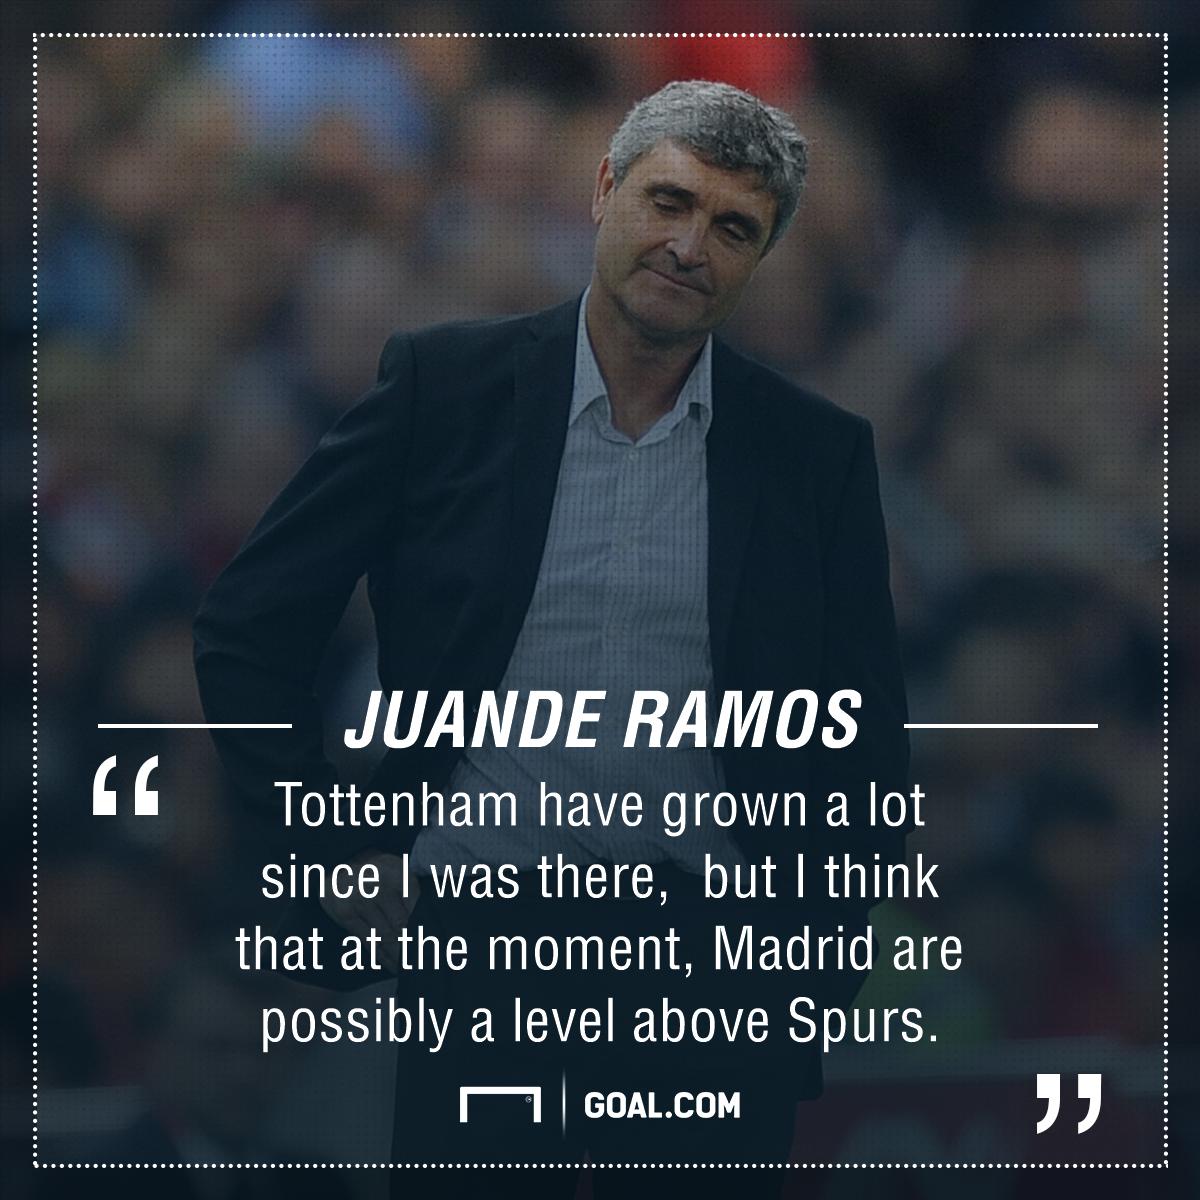 Juande Ramos quote